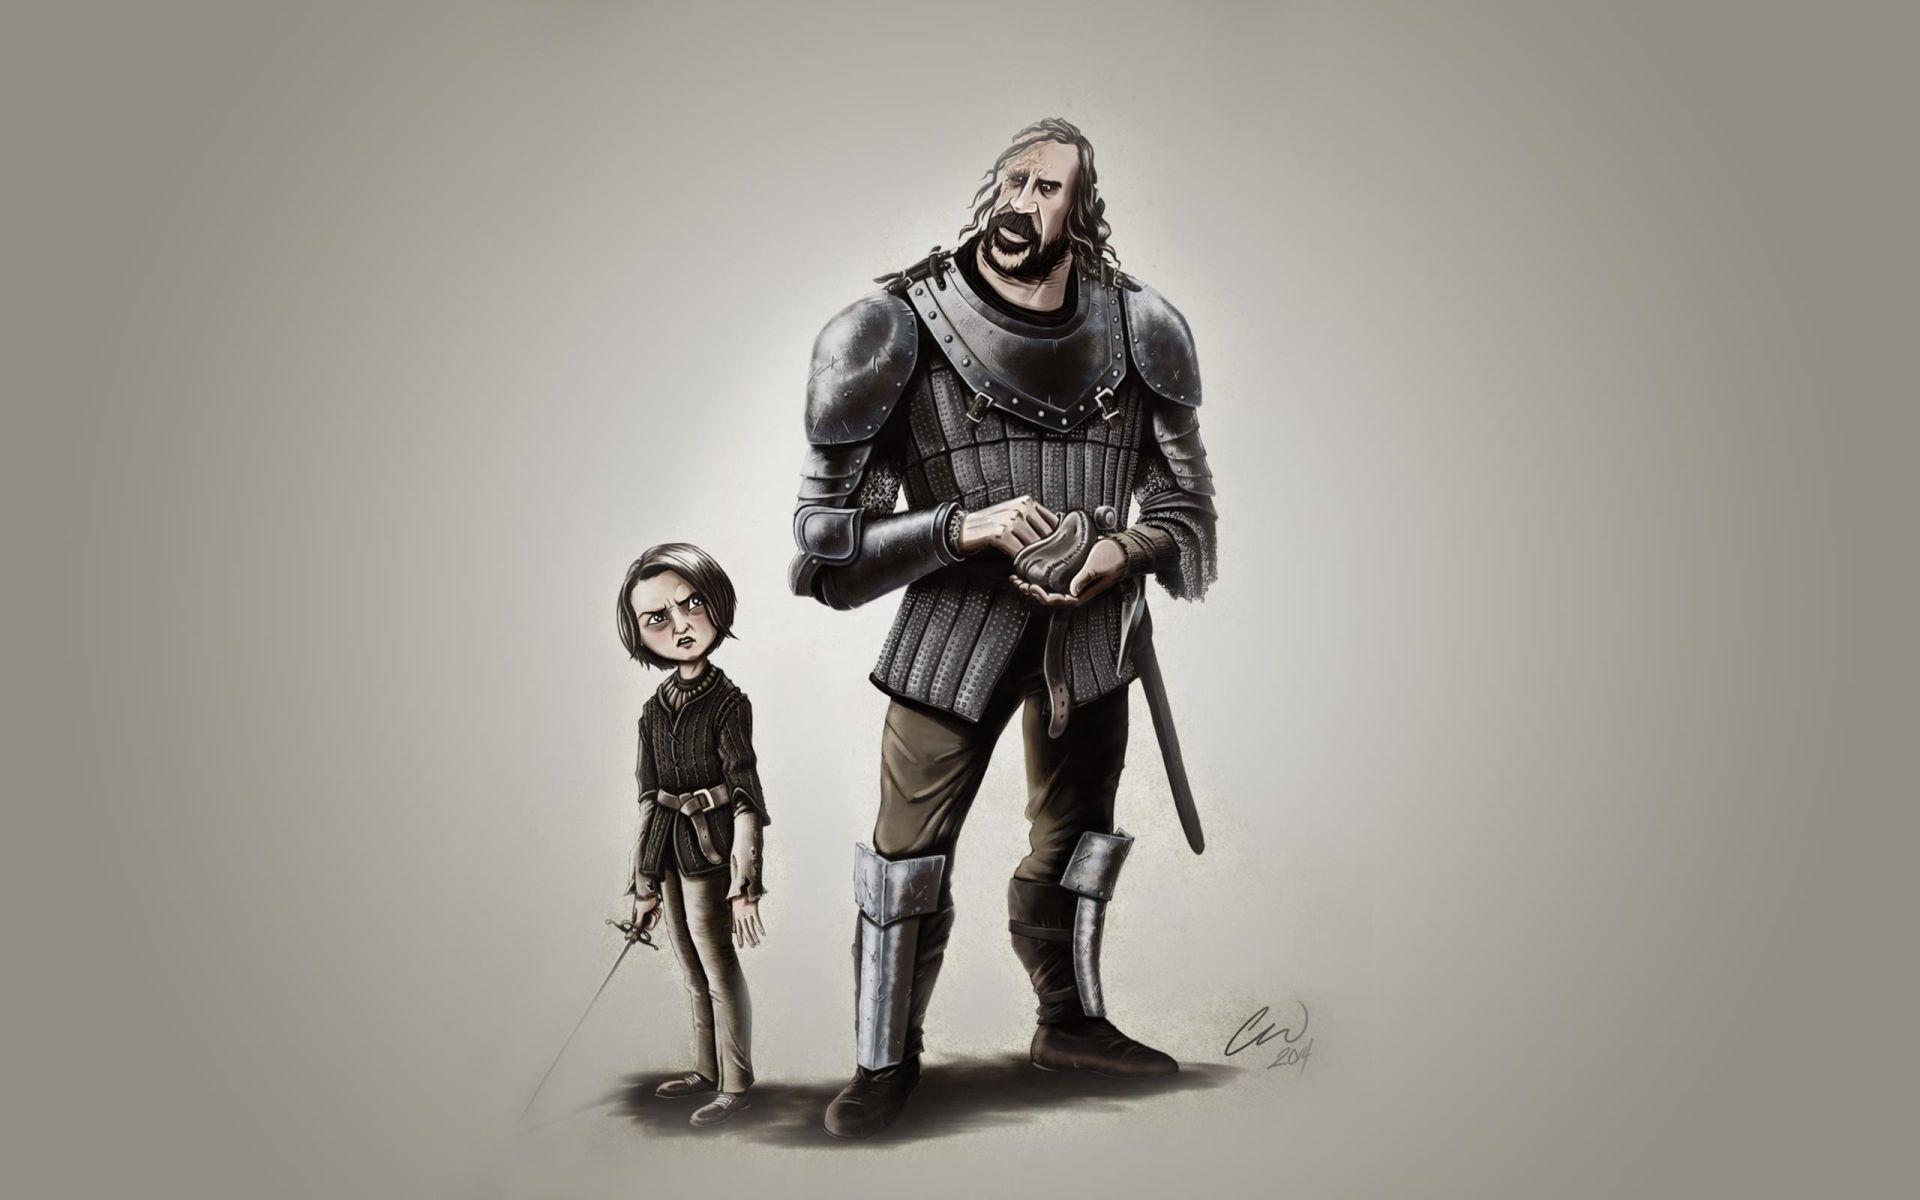 Game of Thrones fanart